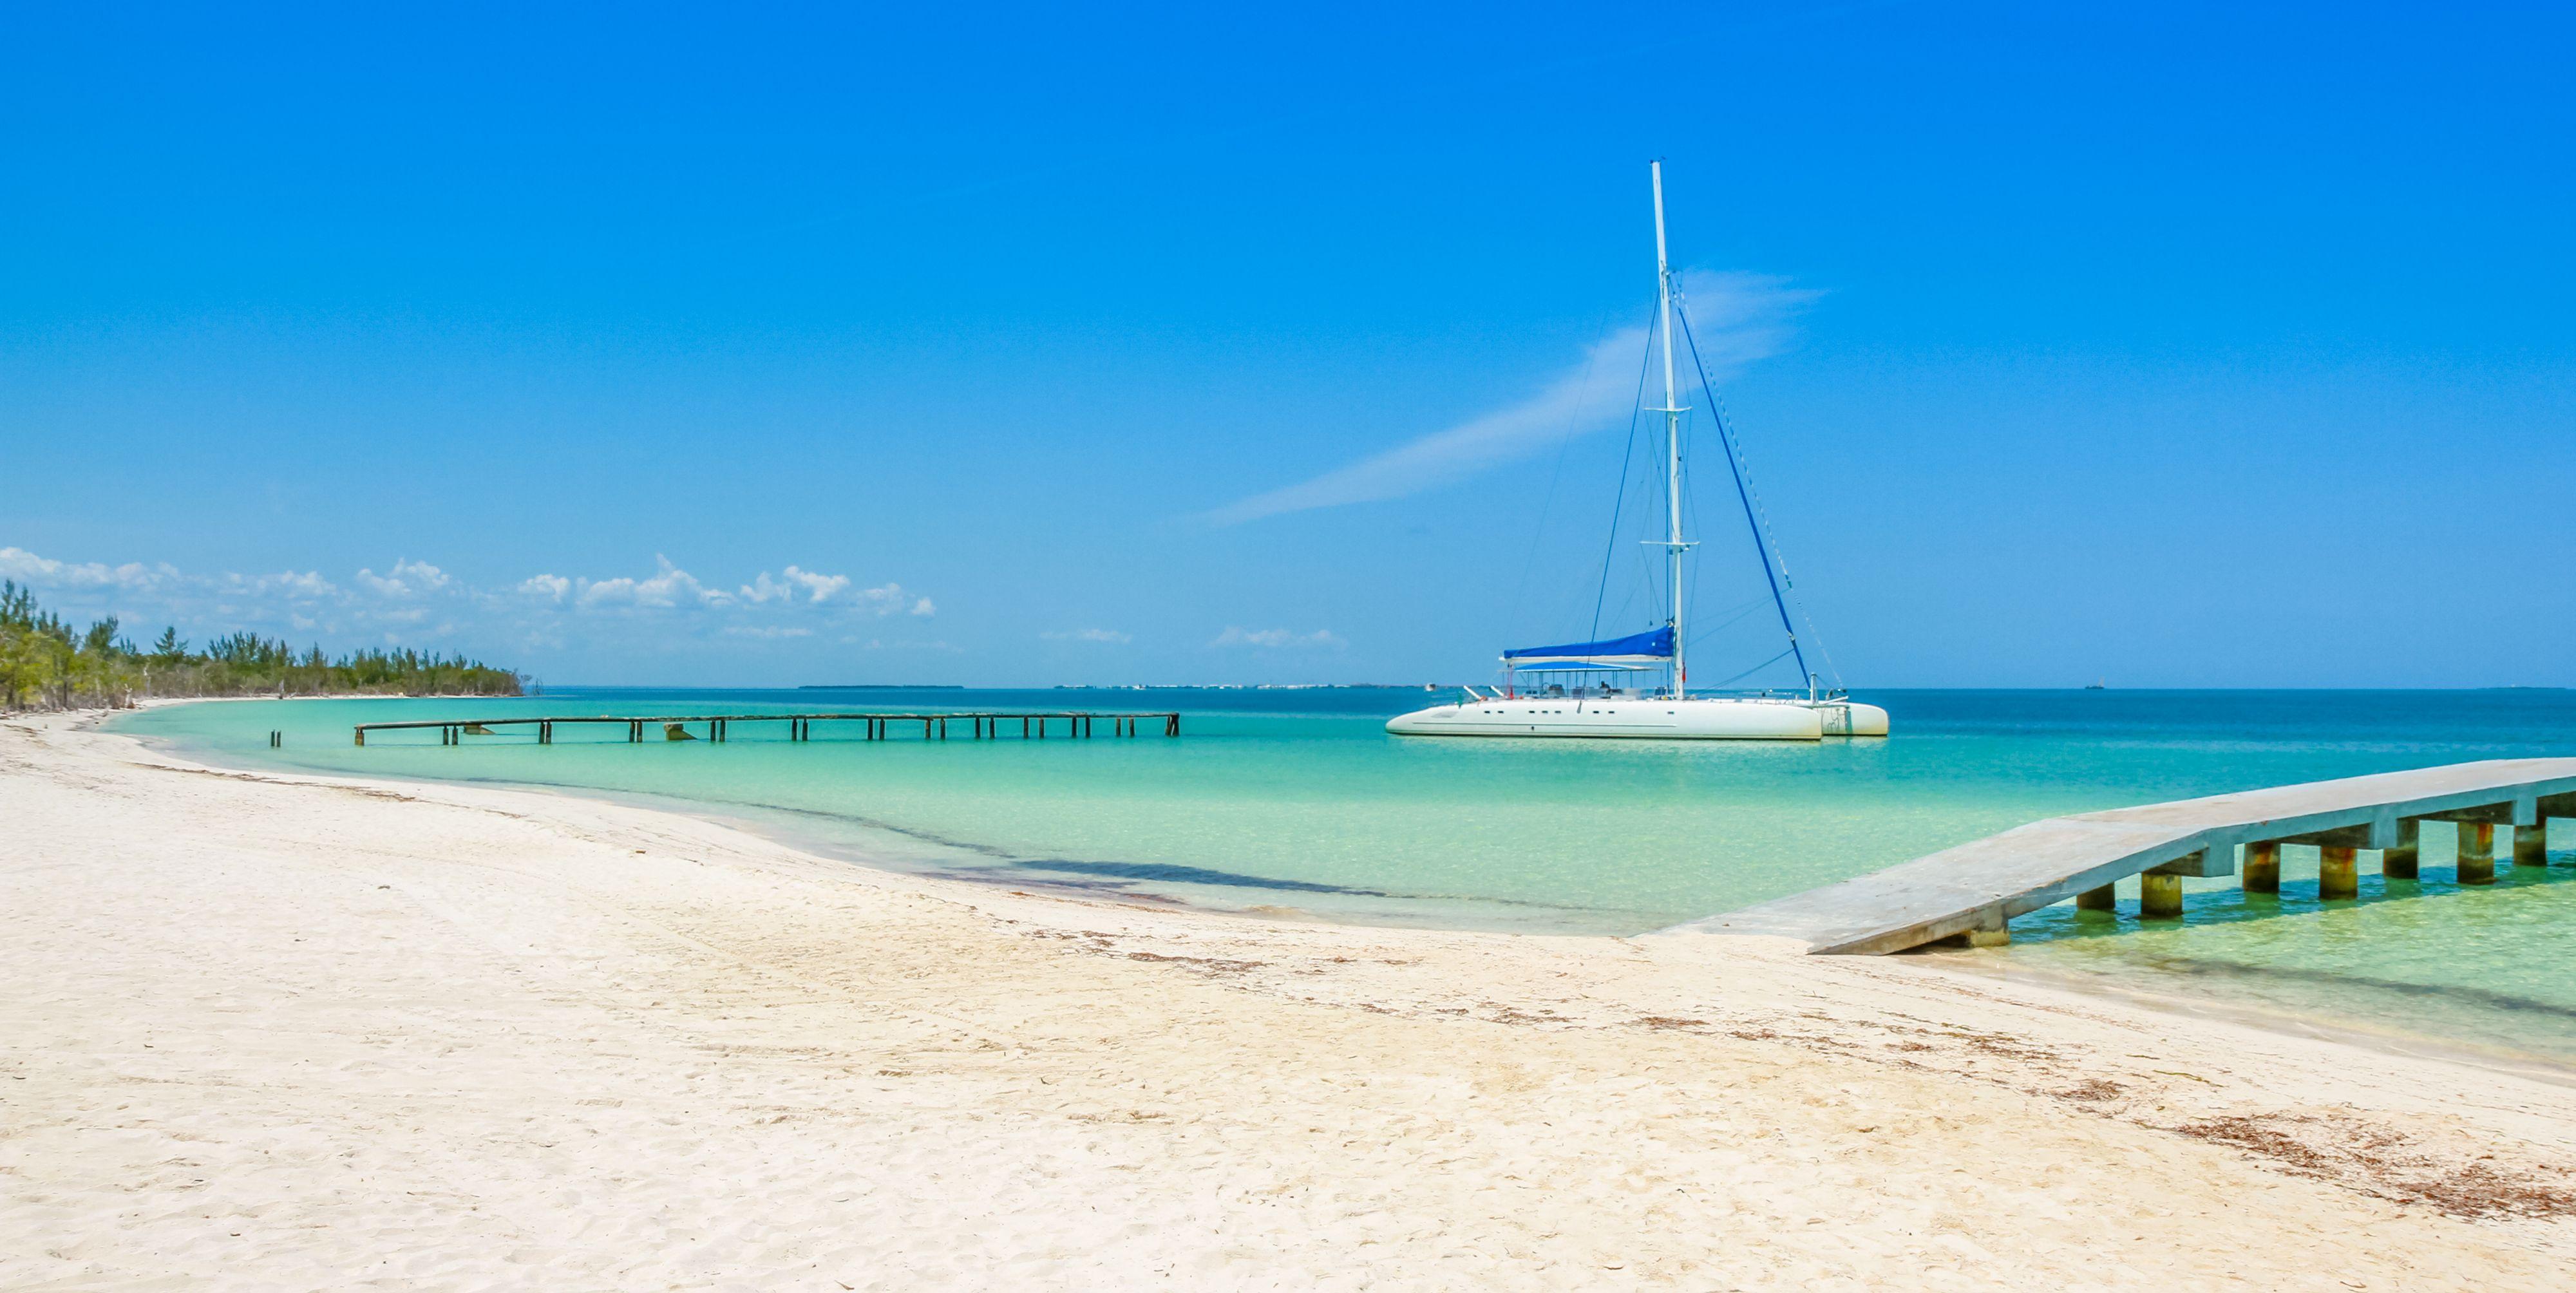 best beaches in the world -Varadero Beach cuba